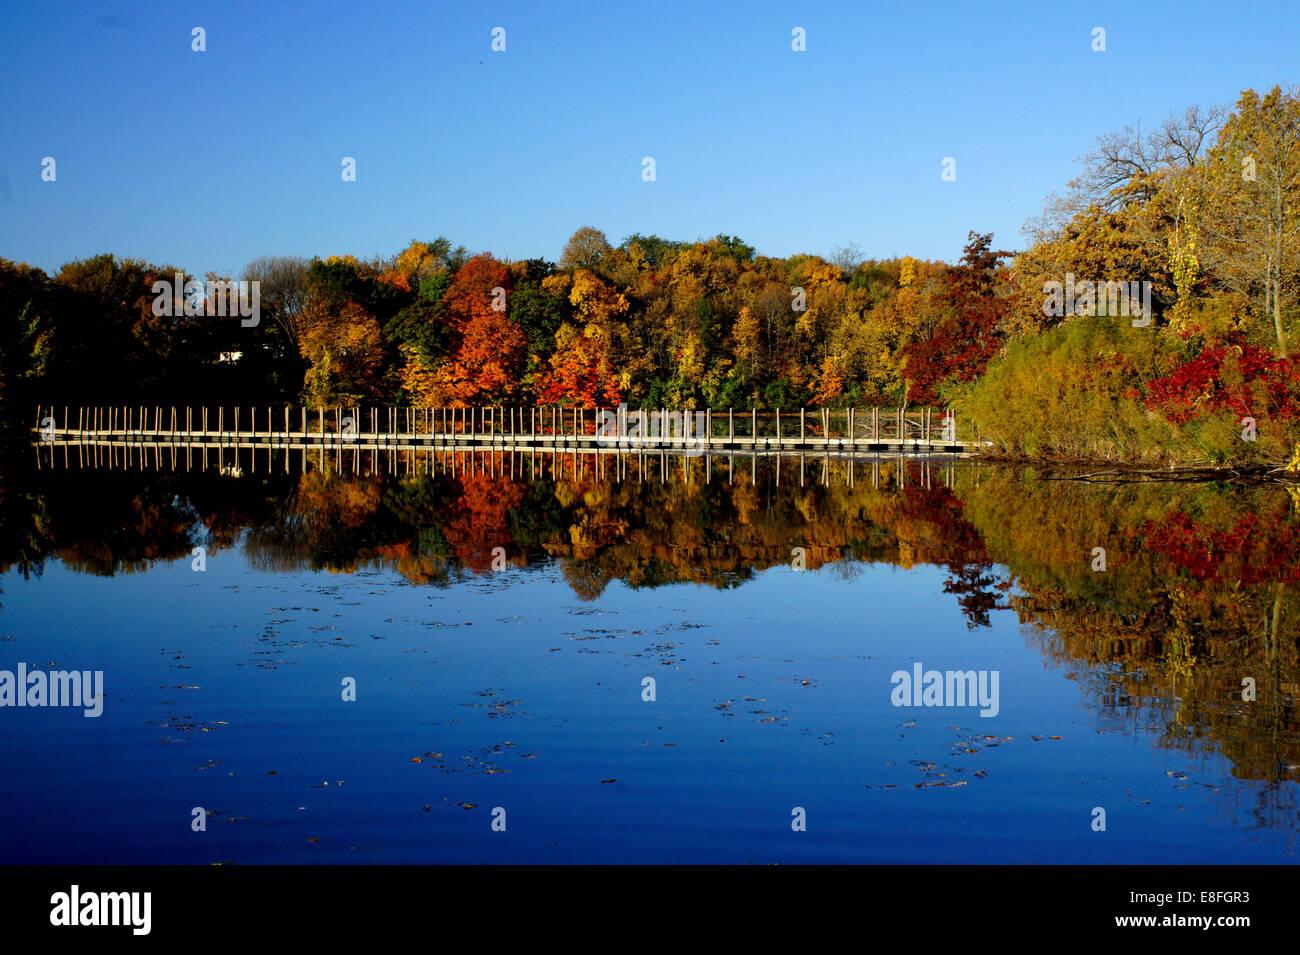 USA, Minnesota, Scott County, View of Prior Lake in autumn - Stock Image